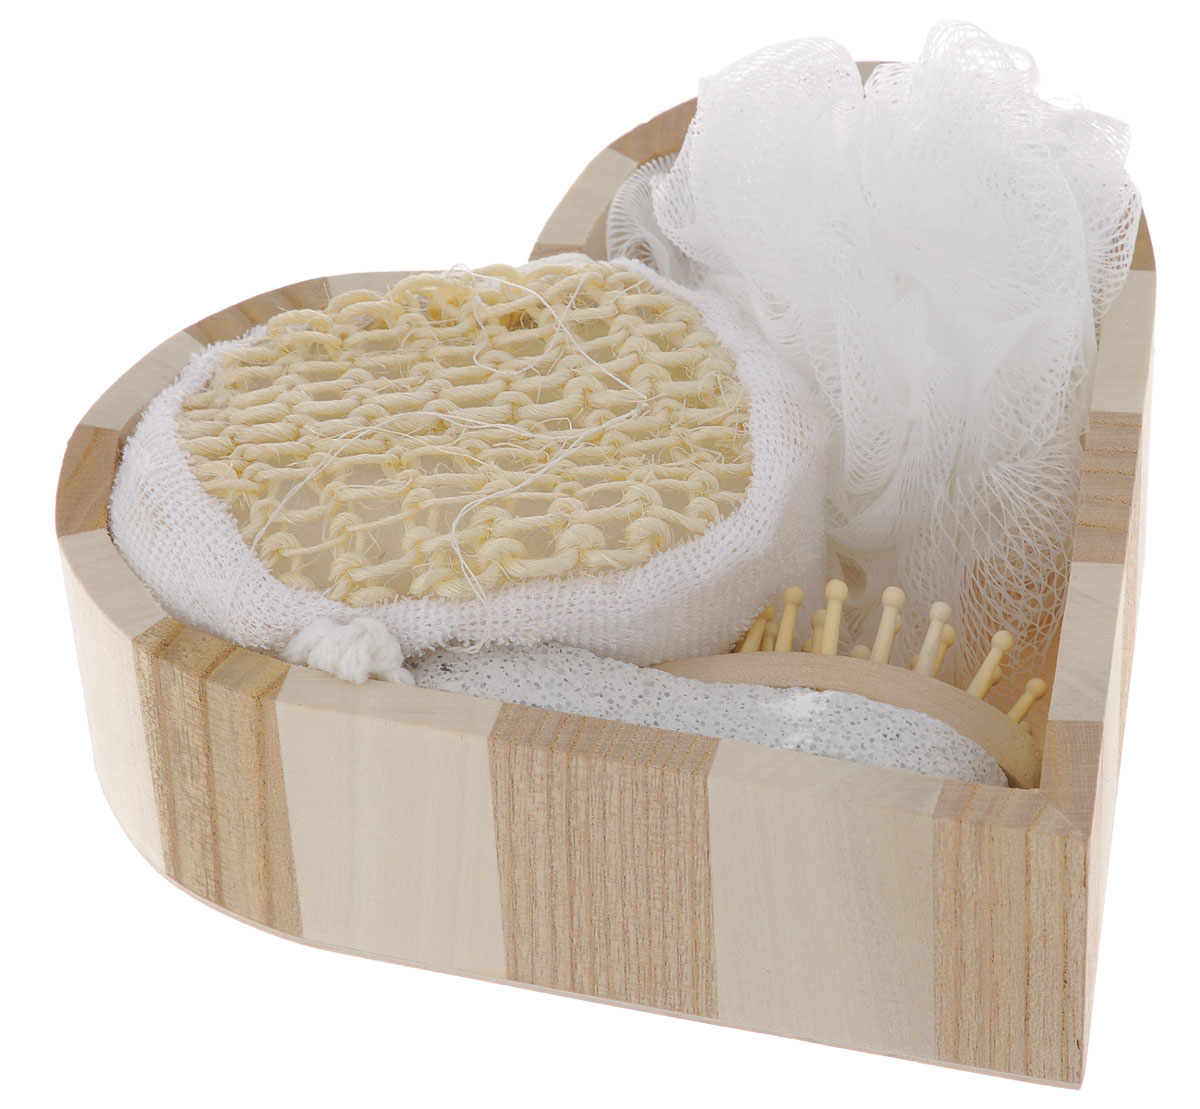 Набор для ванной и бани Феникс-презент Романтика, 5 предметов лампа настольная феникс презент белка цвет белый 17 х 12 х 19 см